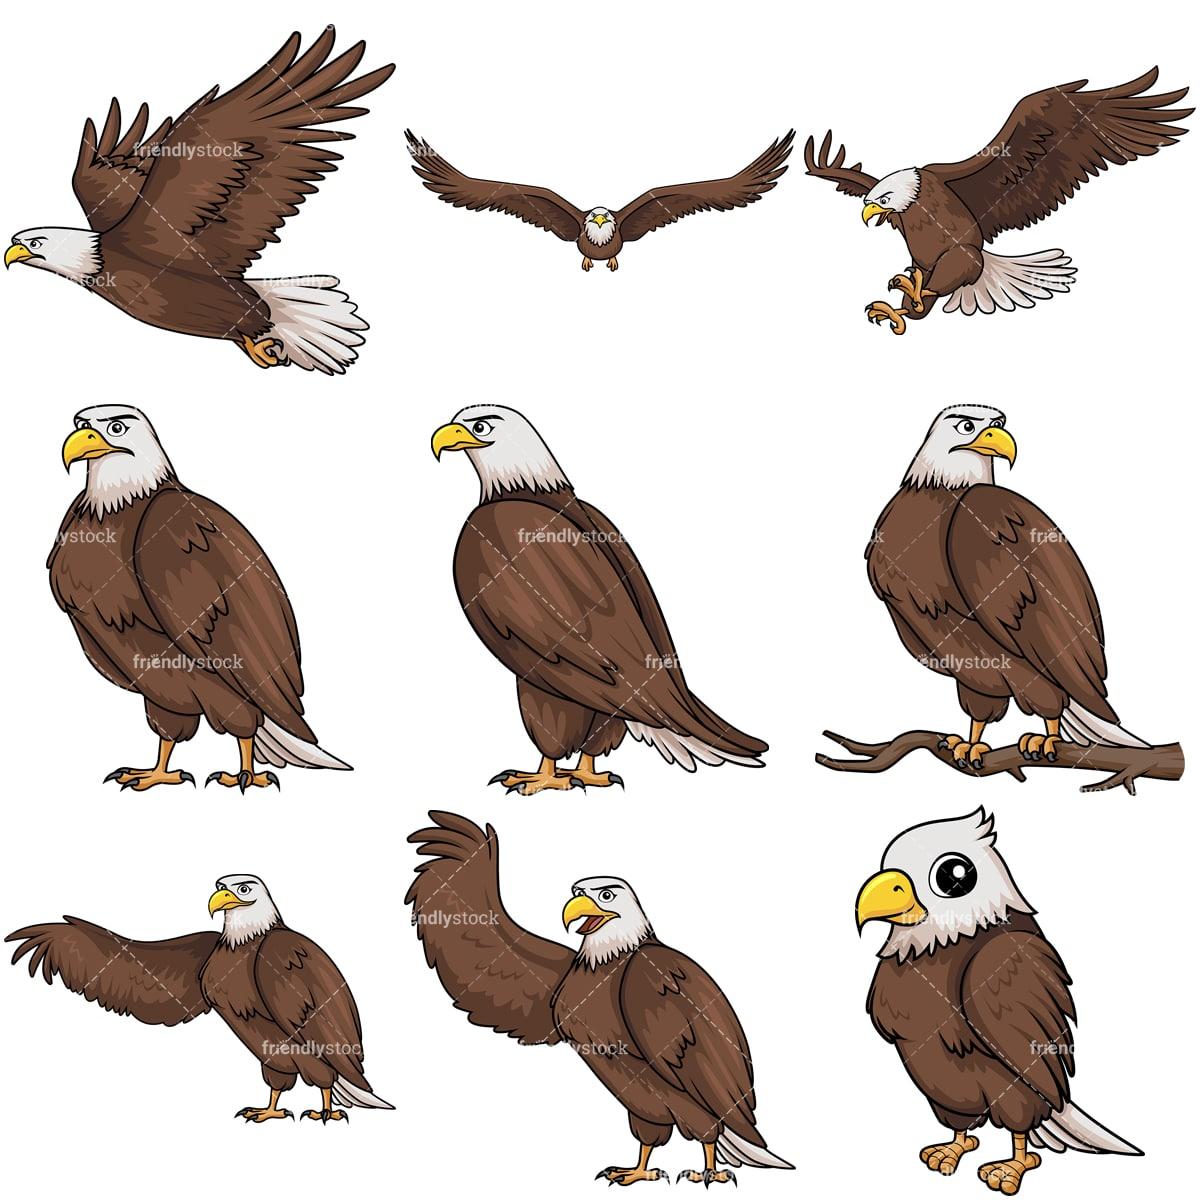 bald eagle cartoon vector clipart - friendlystock  friendlystock